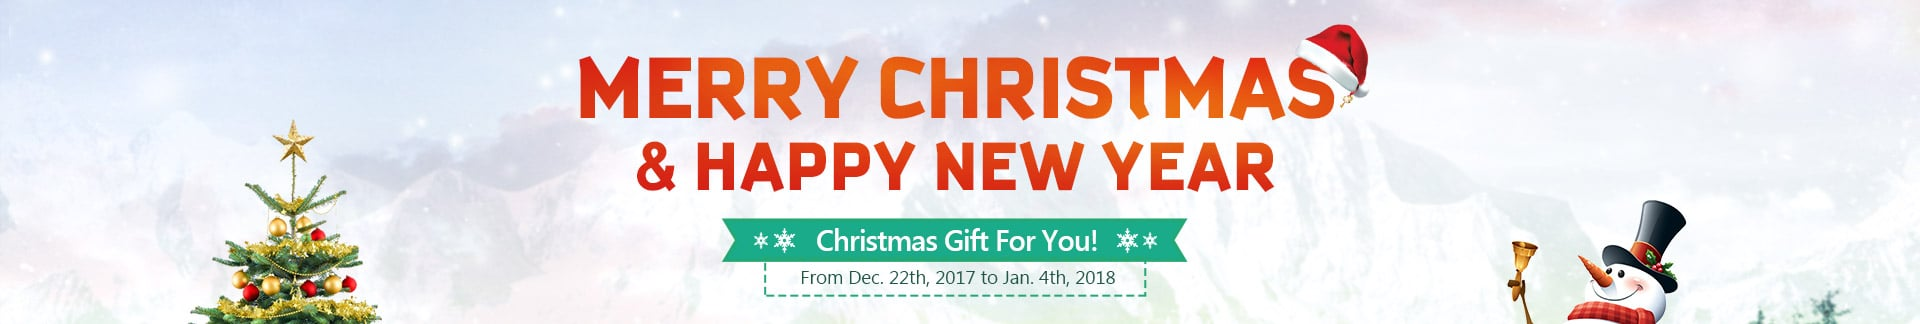 https://www.easeus.com/images_2016/campaign/christmas-campaign-2017/banner-1.jpg